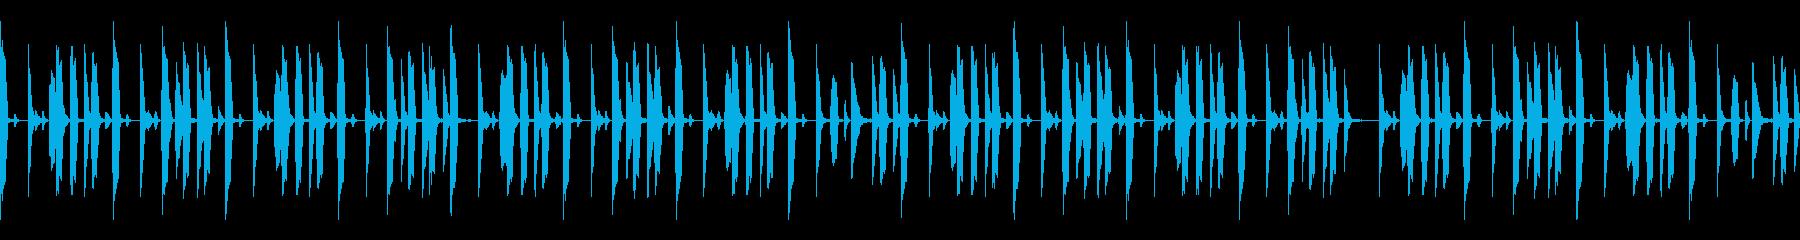 BPM100 ドラムループの再生済みの波形